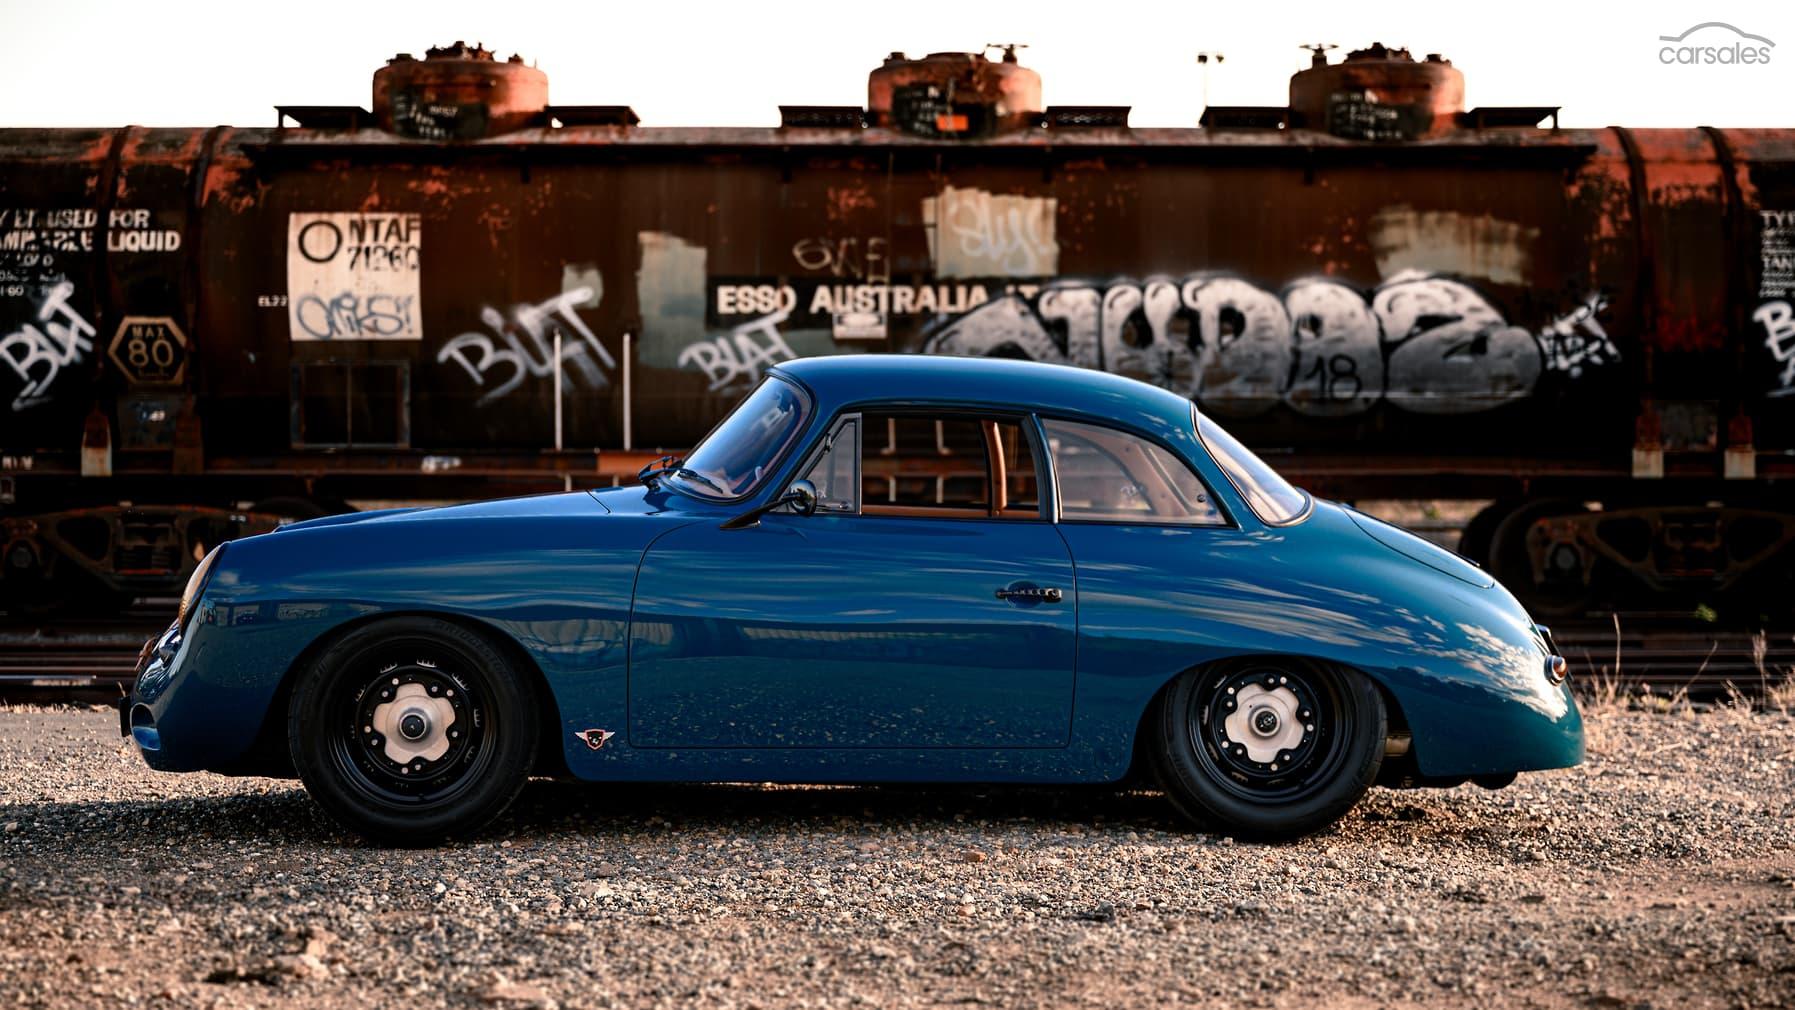 Porsche 356B Notchback '62 - Outlaw Thérapie... 1